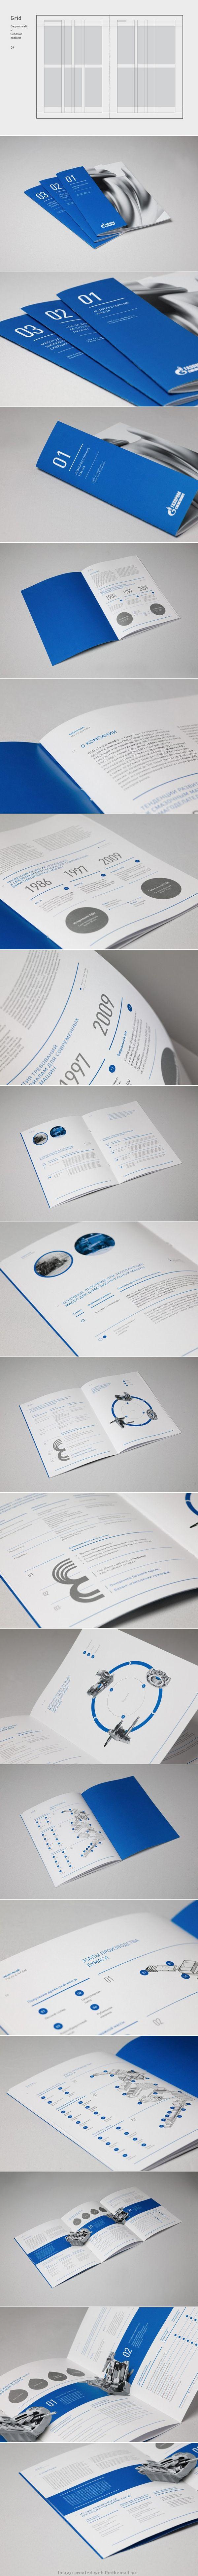 corporate layout   ----  Gazpromneft booklets by Dima Kuzmichev